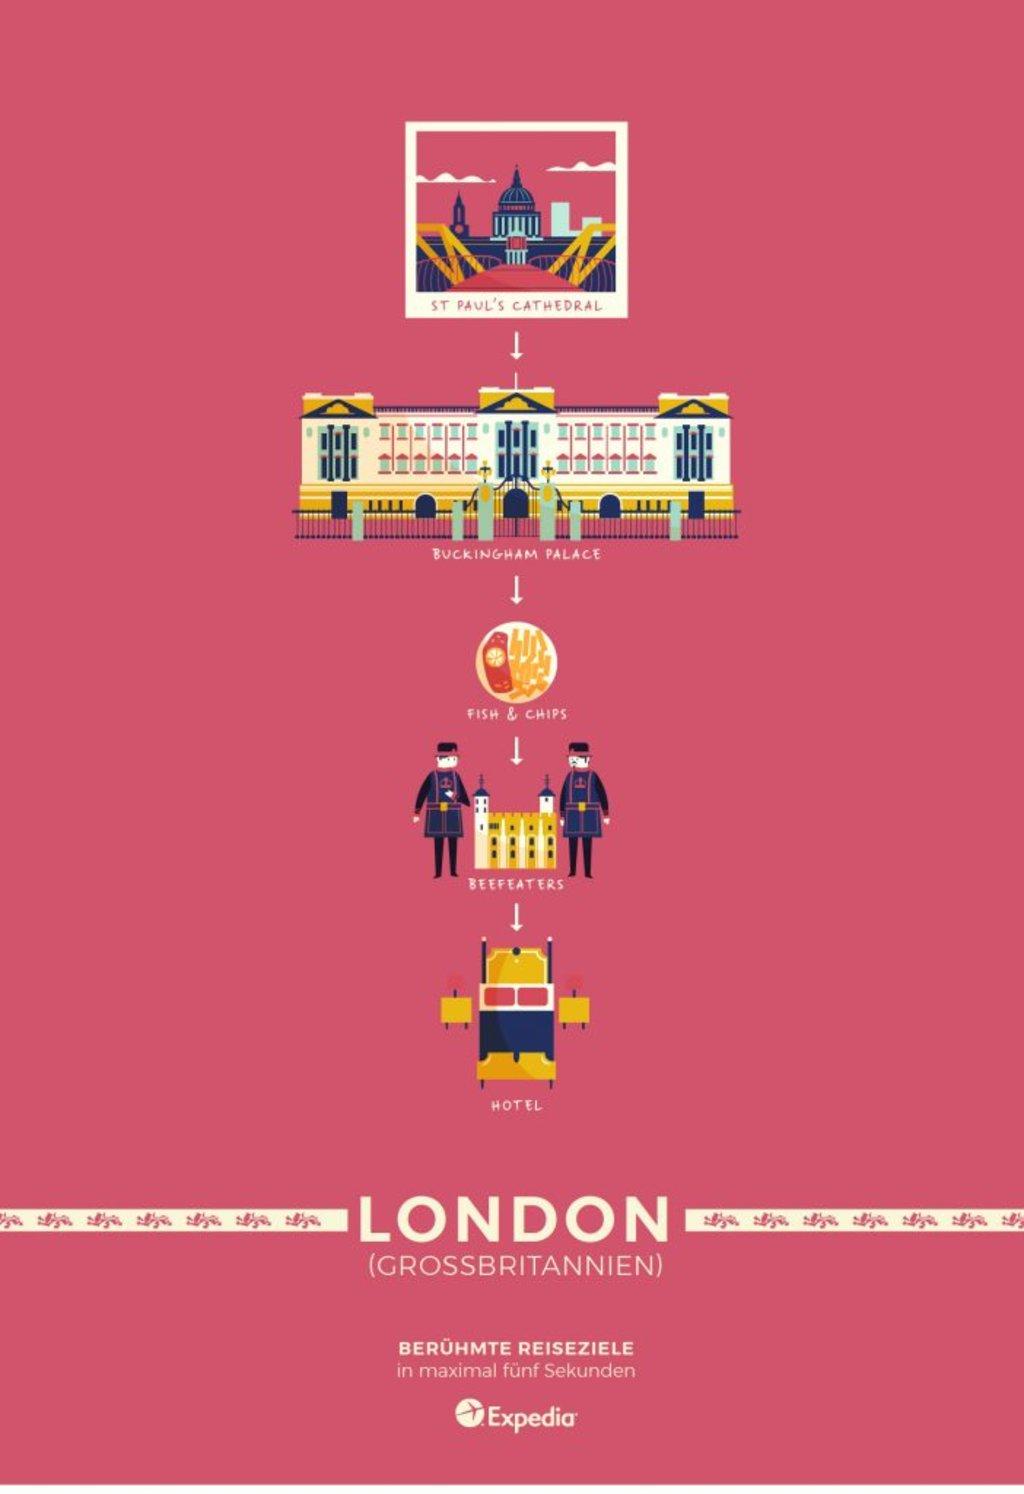 Reiseziele in 5 Sekunden: London